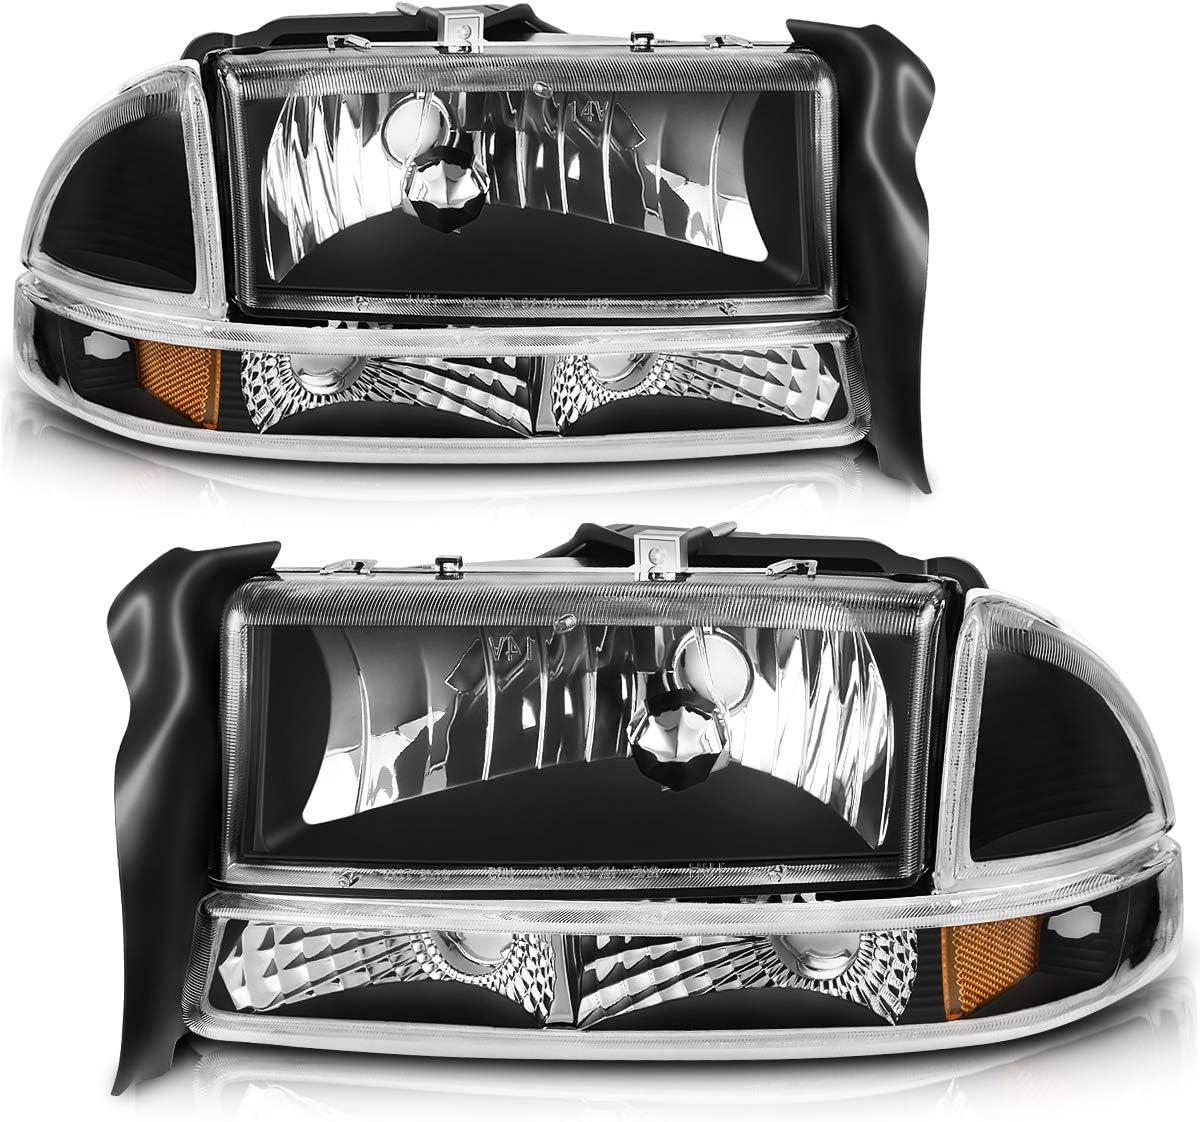 Amazon Com Autosaver88 Headlight Assembly Compatible With 1997 2004 Dodge Dakota 98 03 Dodge Durango Headlamp Automotive